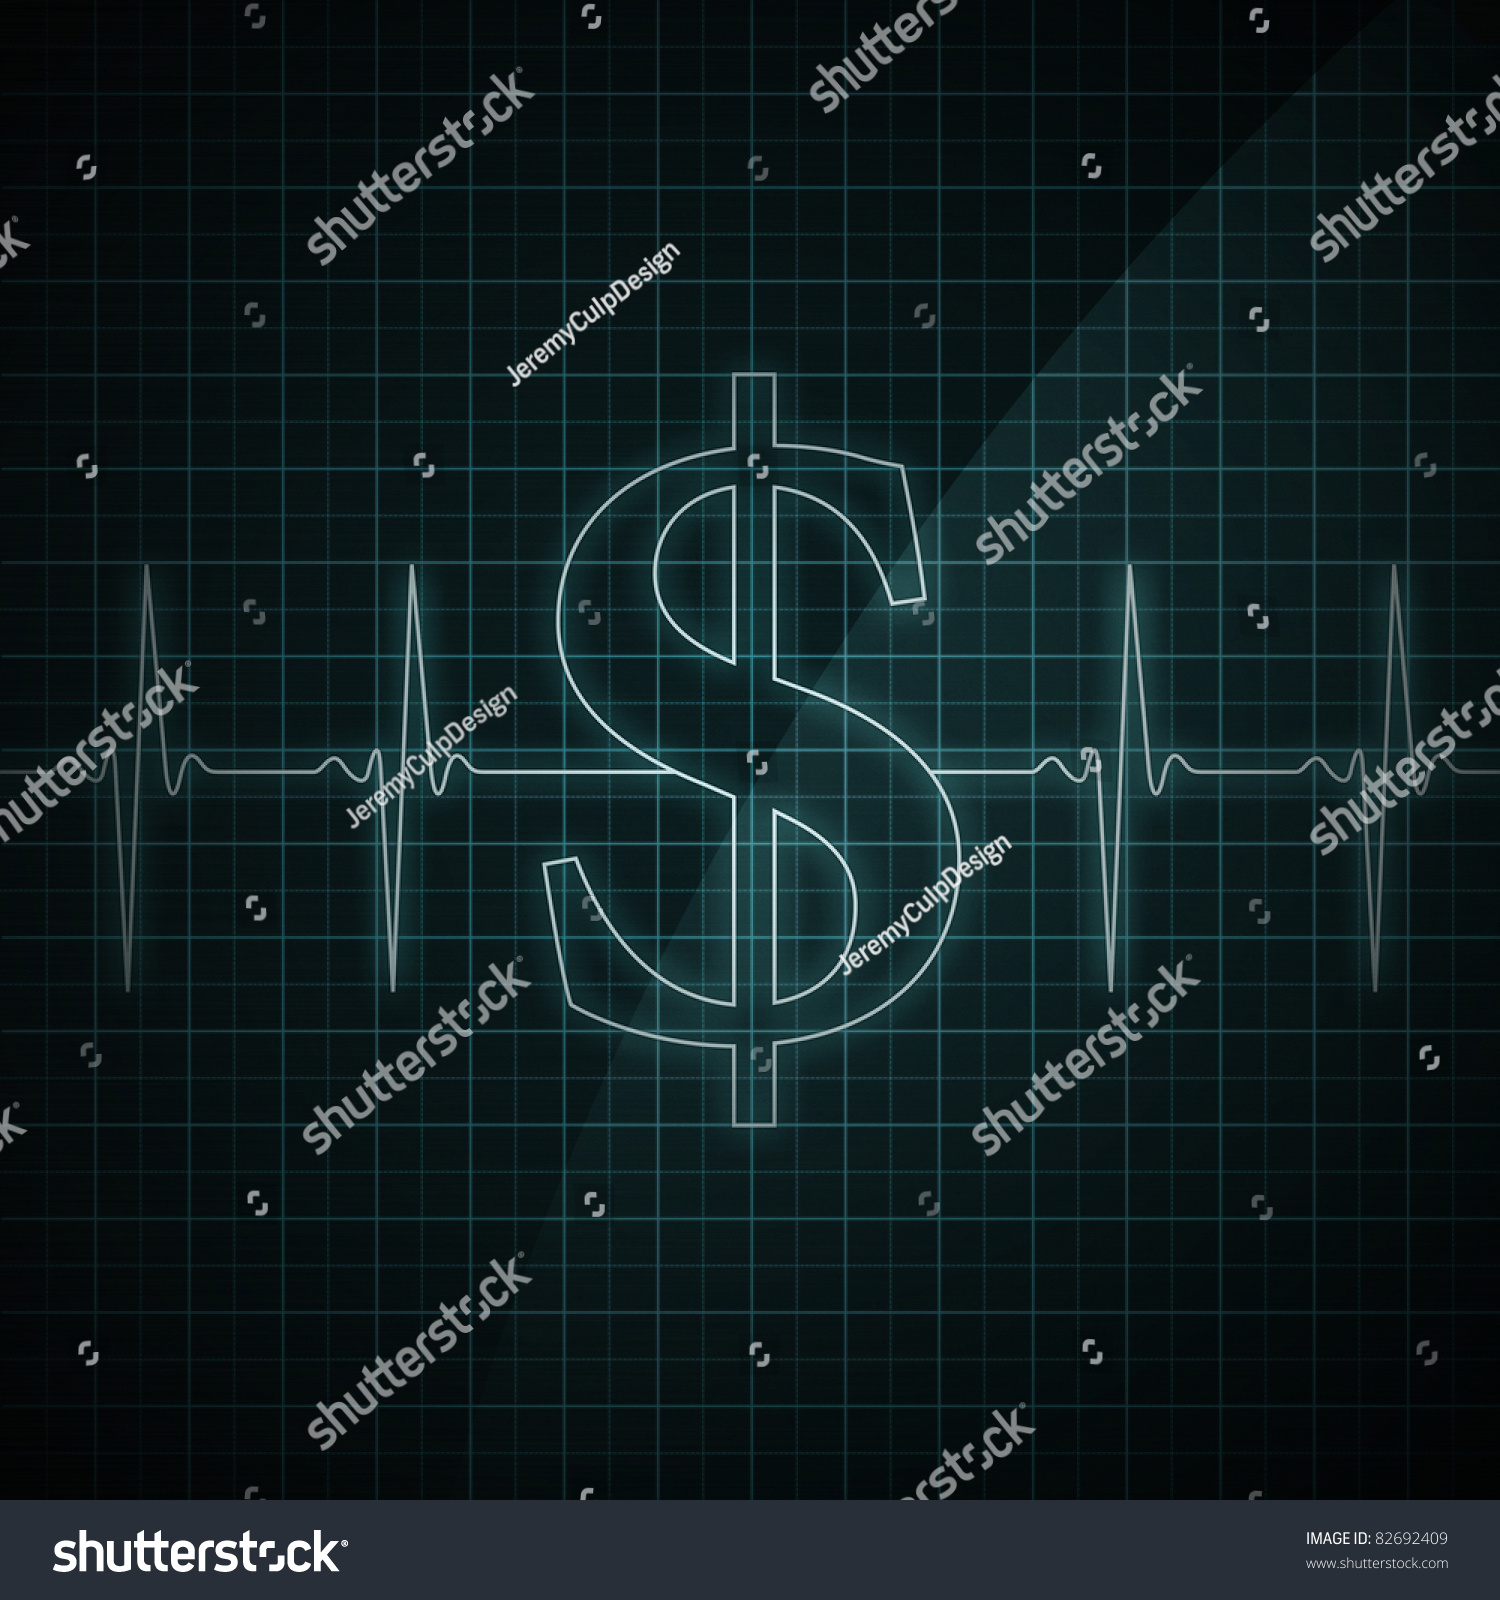 Heart Beat Monitor Showing Dollar Symbol Stock Illustration 82692409 ...